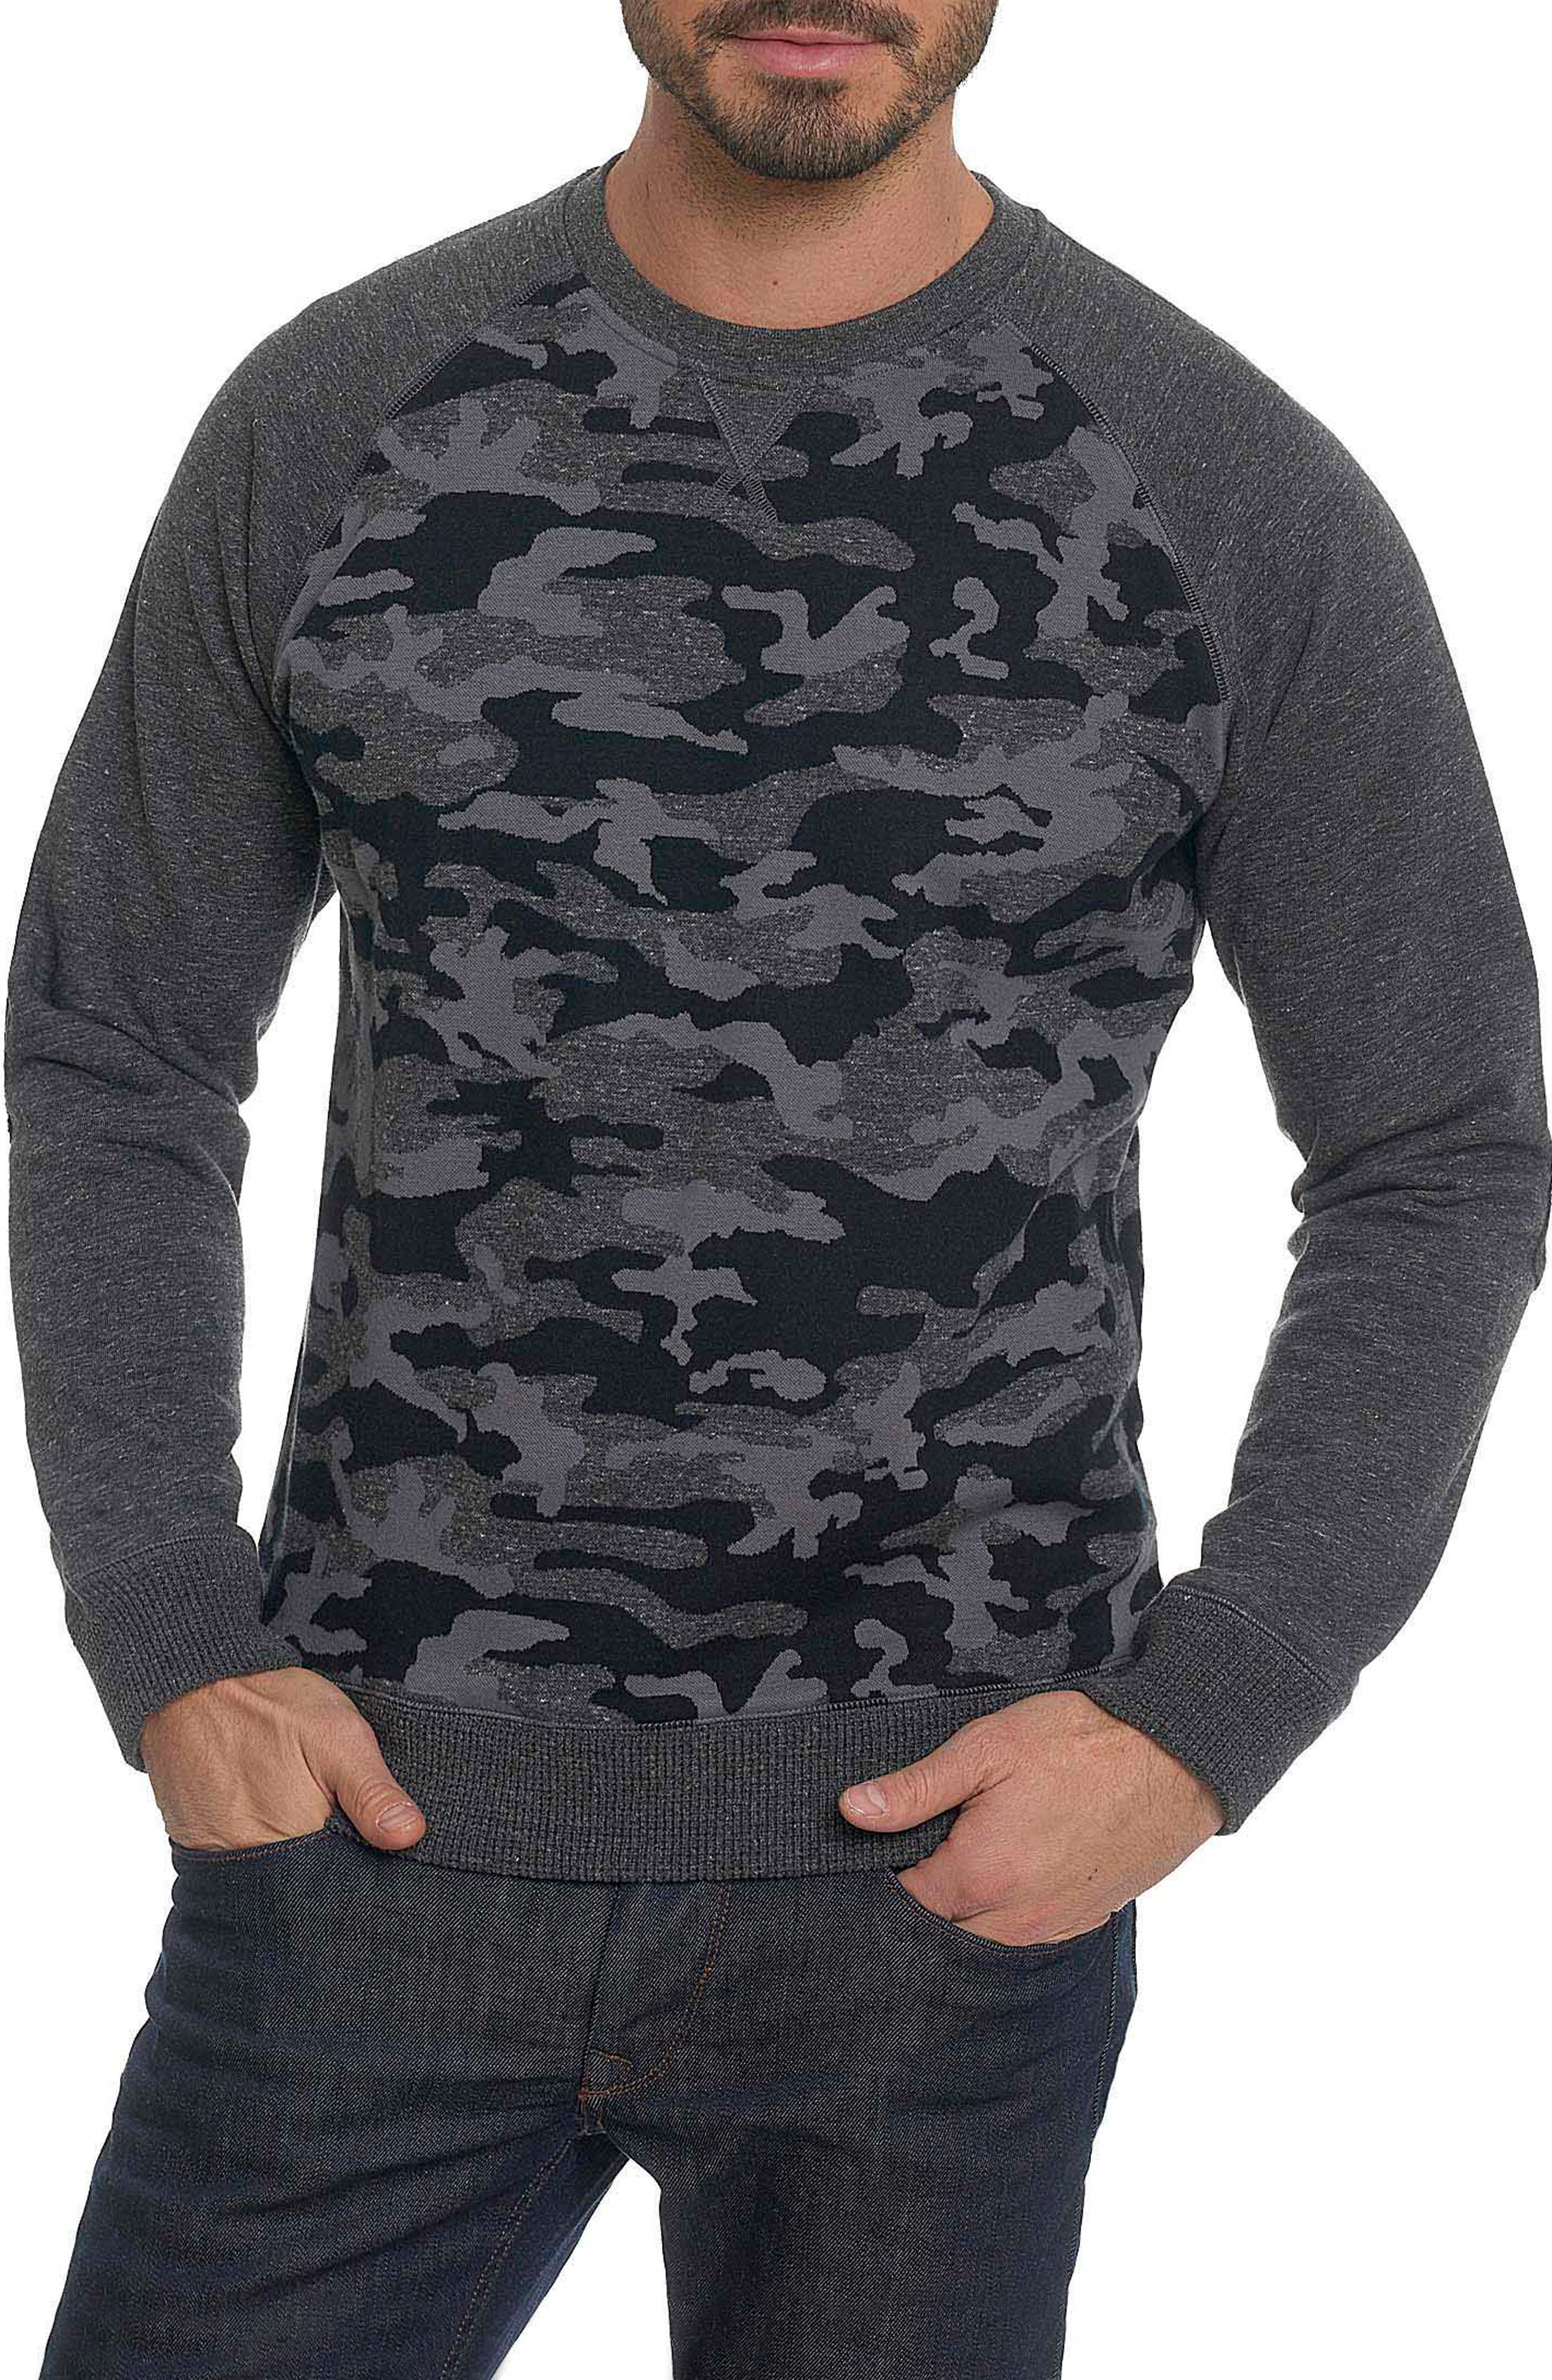 Mooers Camo Raglan Sleeve Shirt,                         Main,                         color, Charcoal